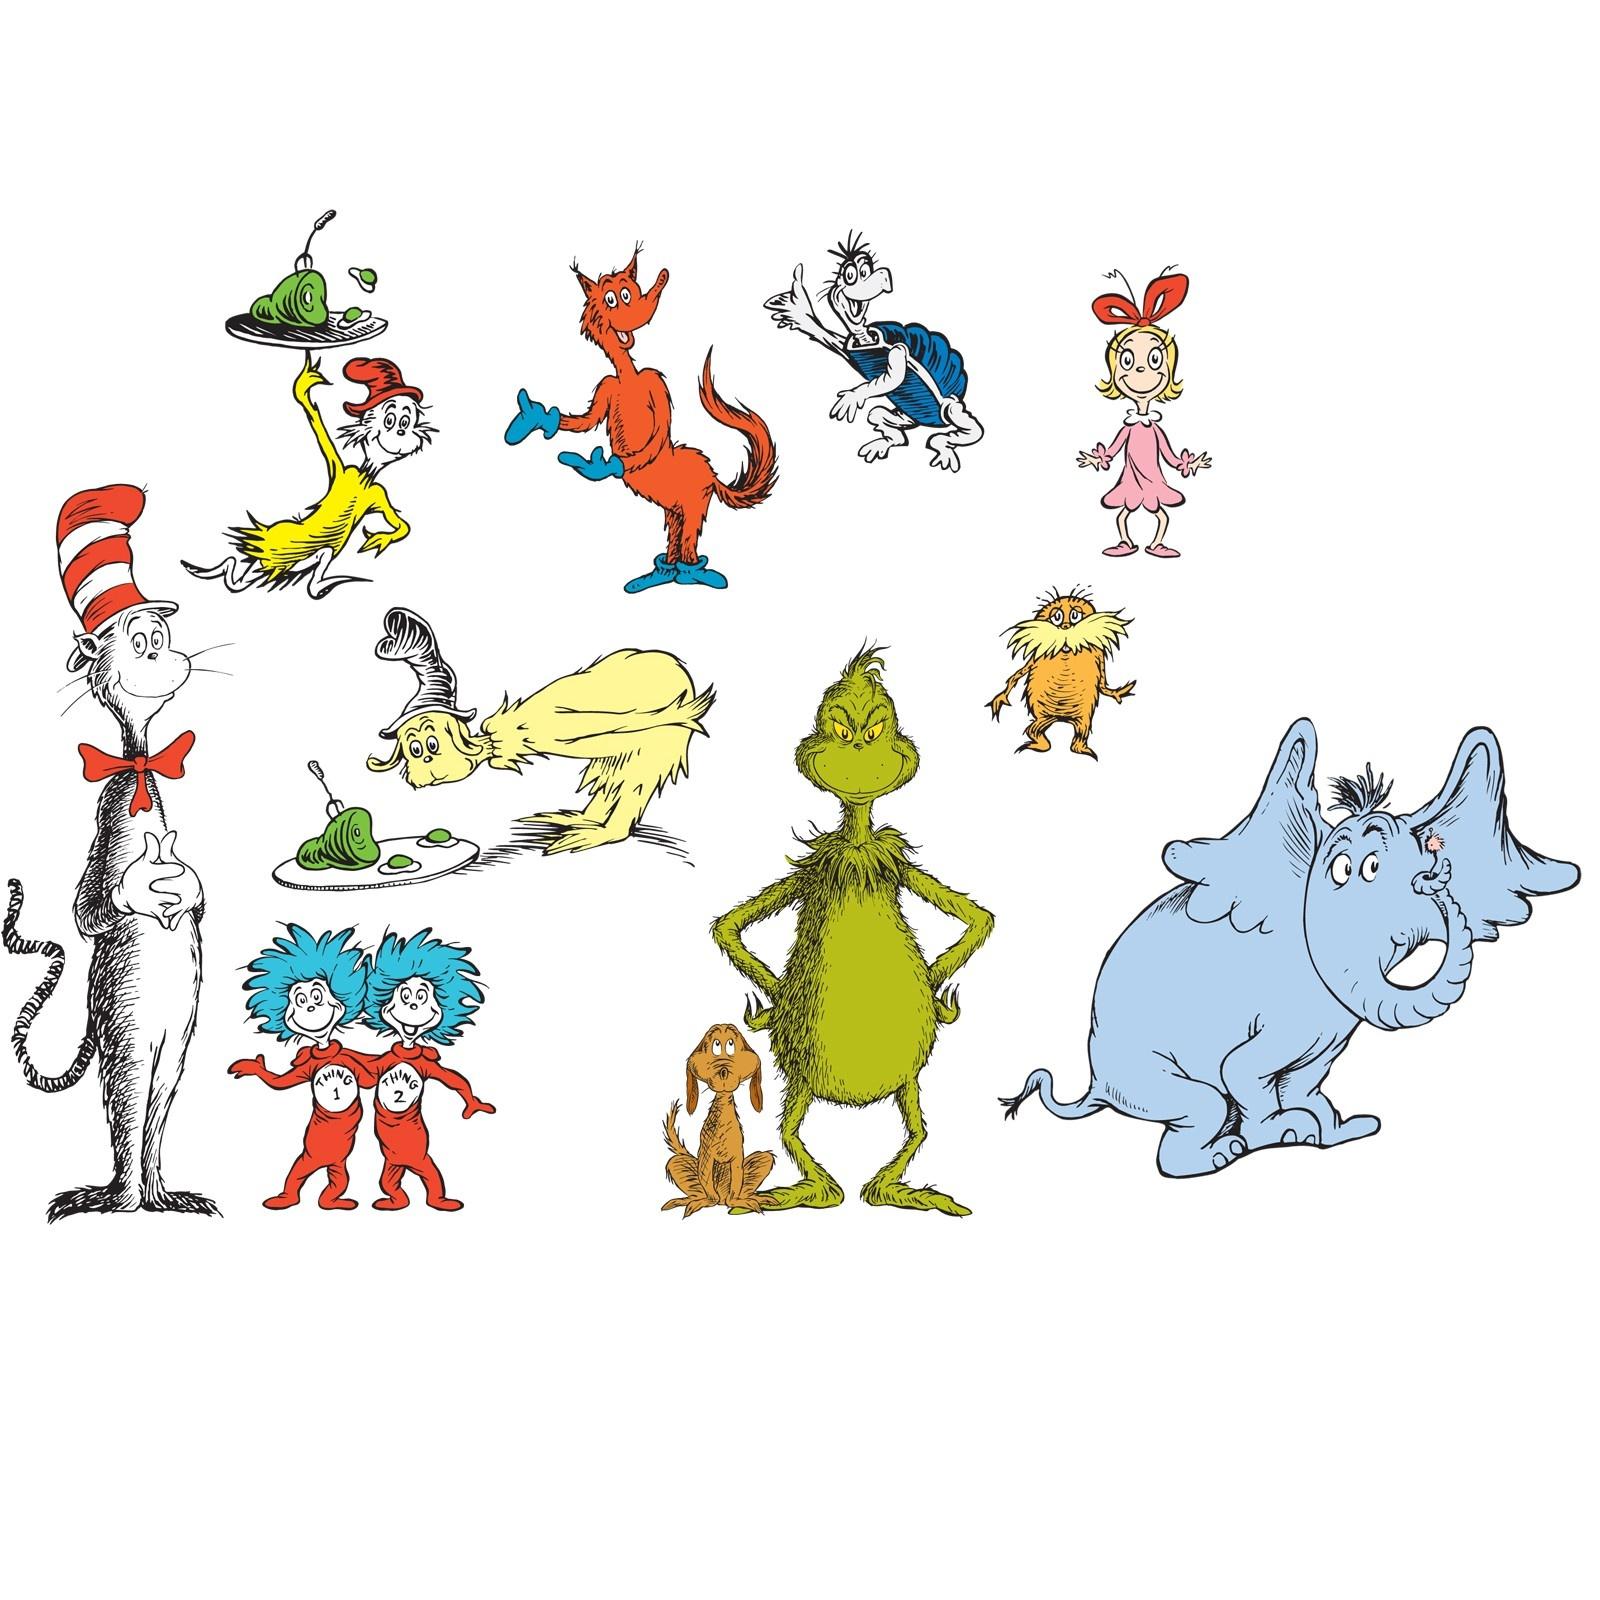 Free Clip Art Of Dr Seuss Characters – 101 Clip Art - Free Printable Dr Seuss Characters